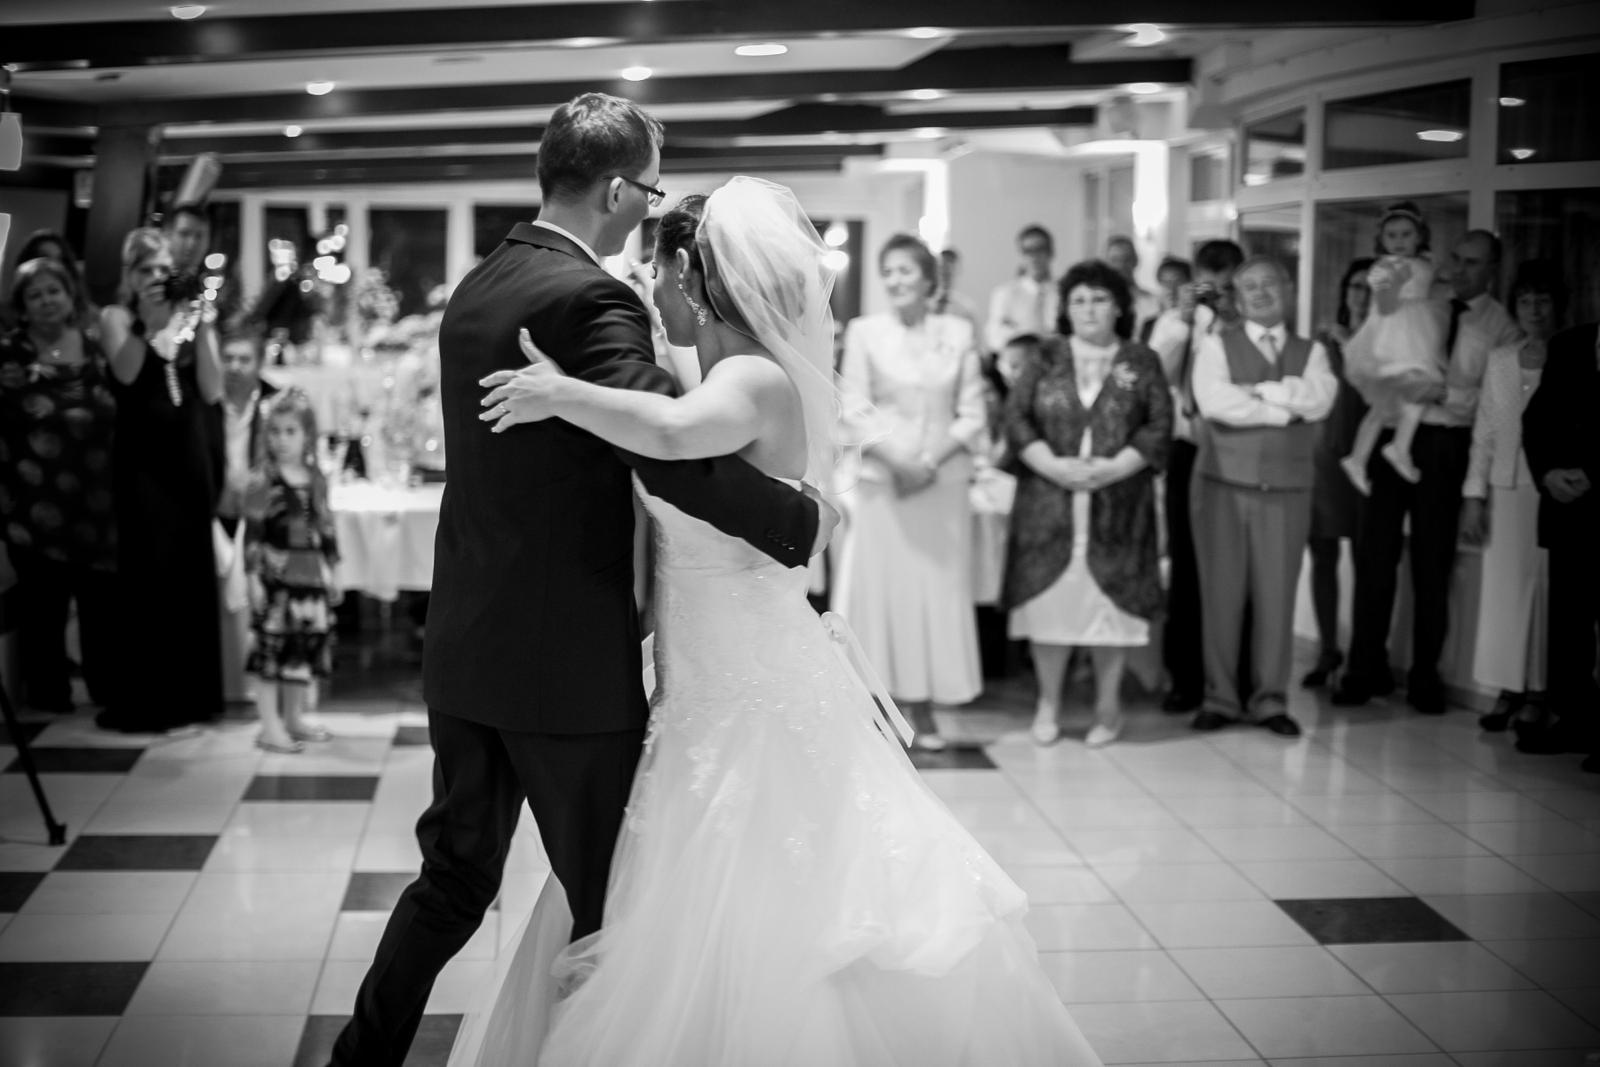 KATKA{{_AND_}} PEŤO Októbrová romanca - Náš manželský tanec